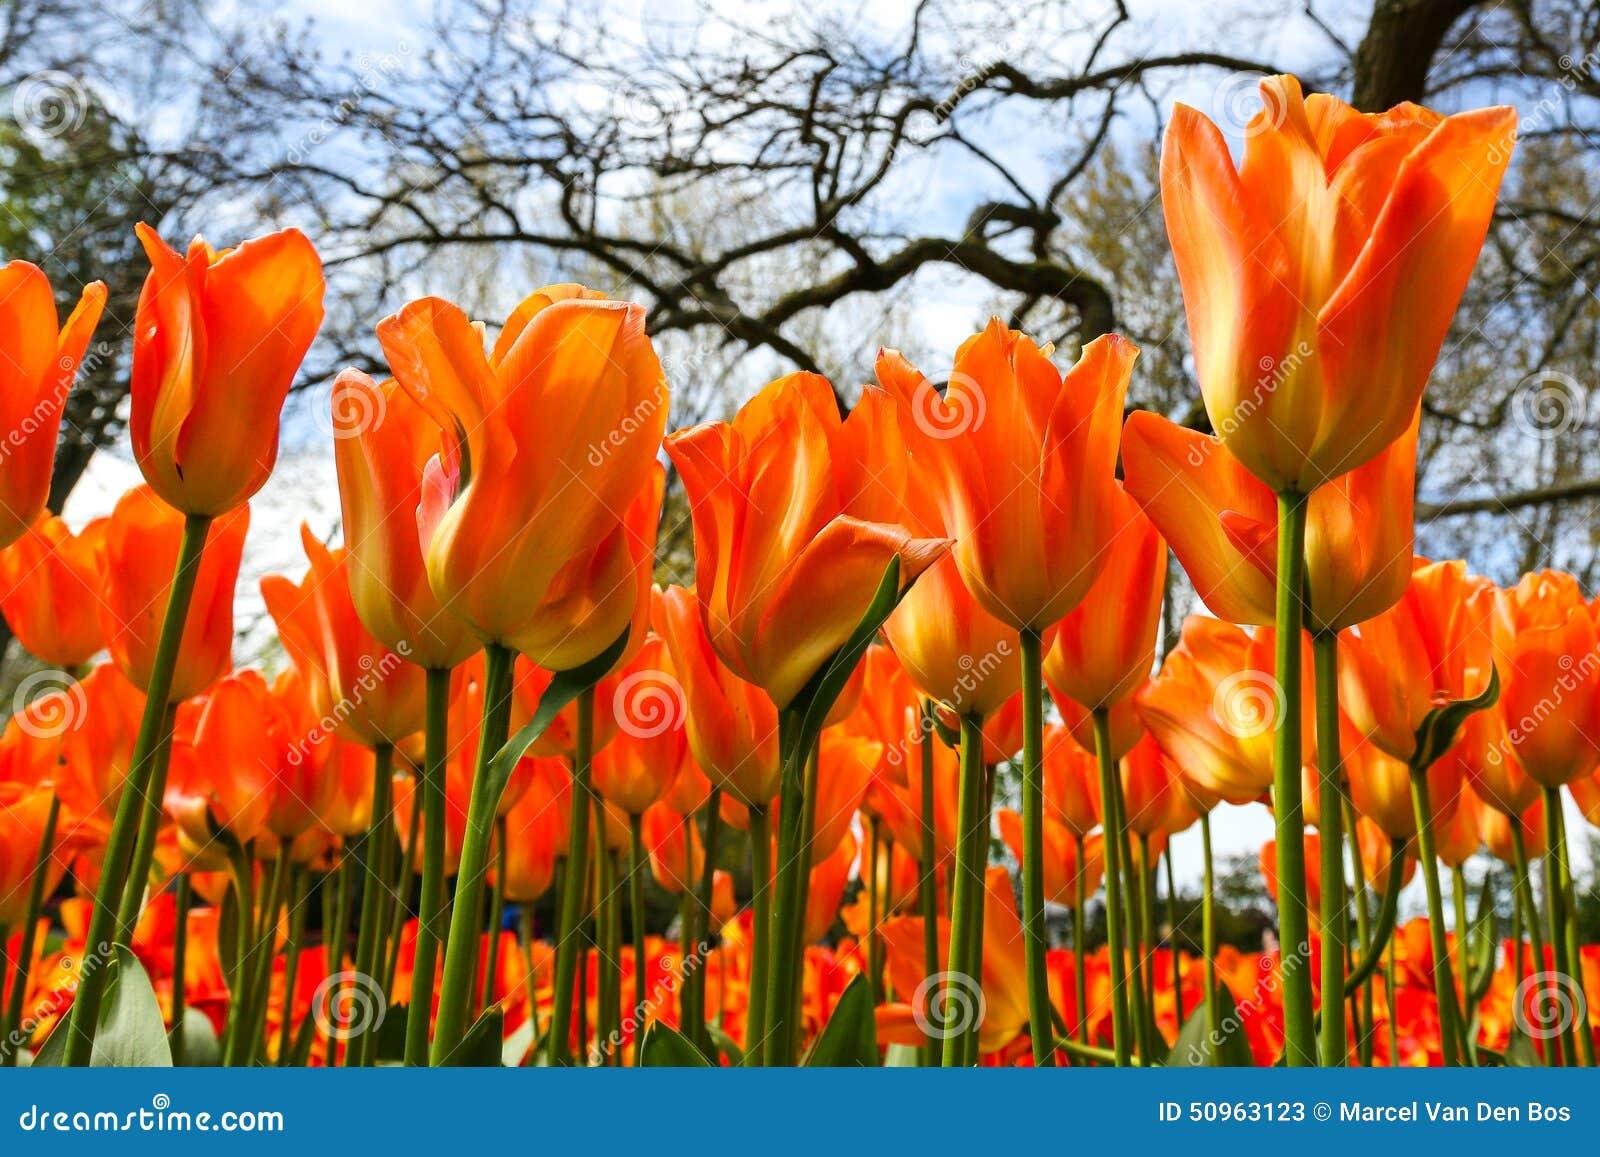 Orange tulips in flower garden